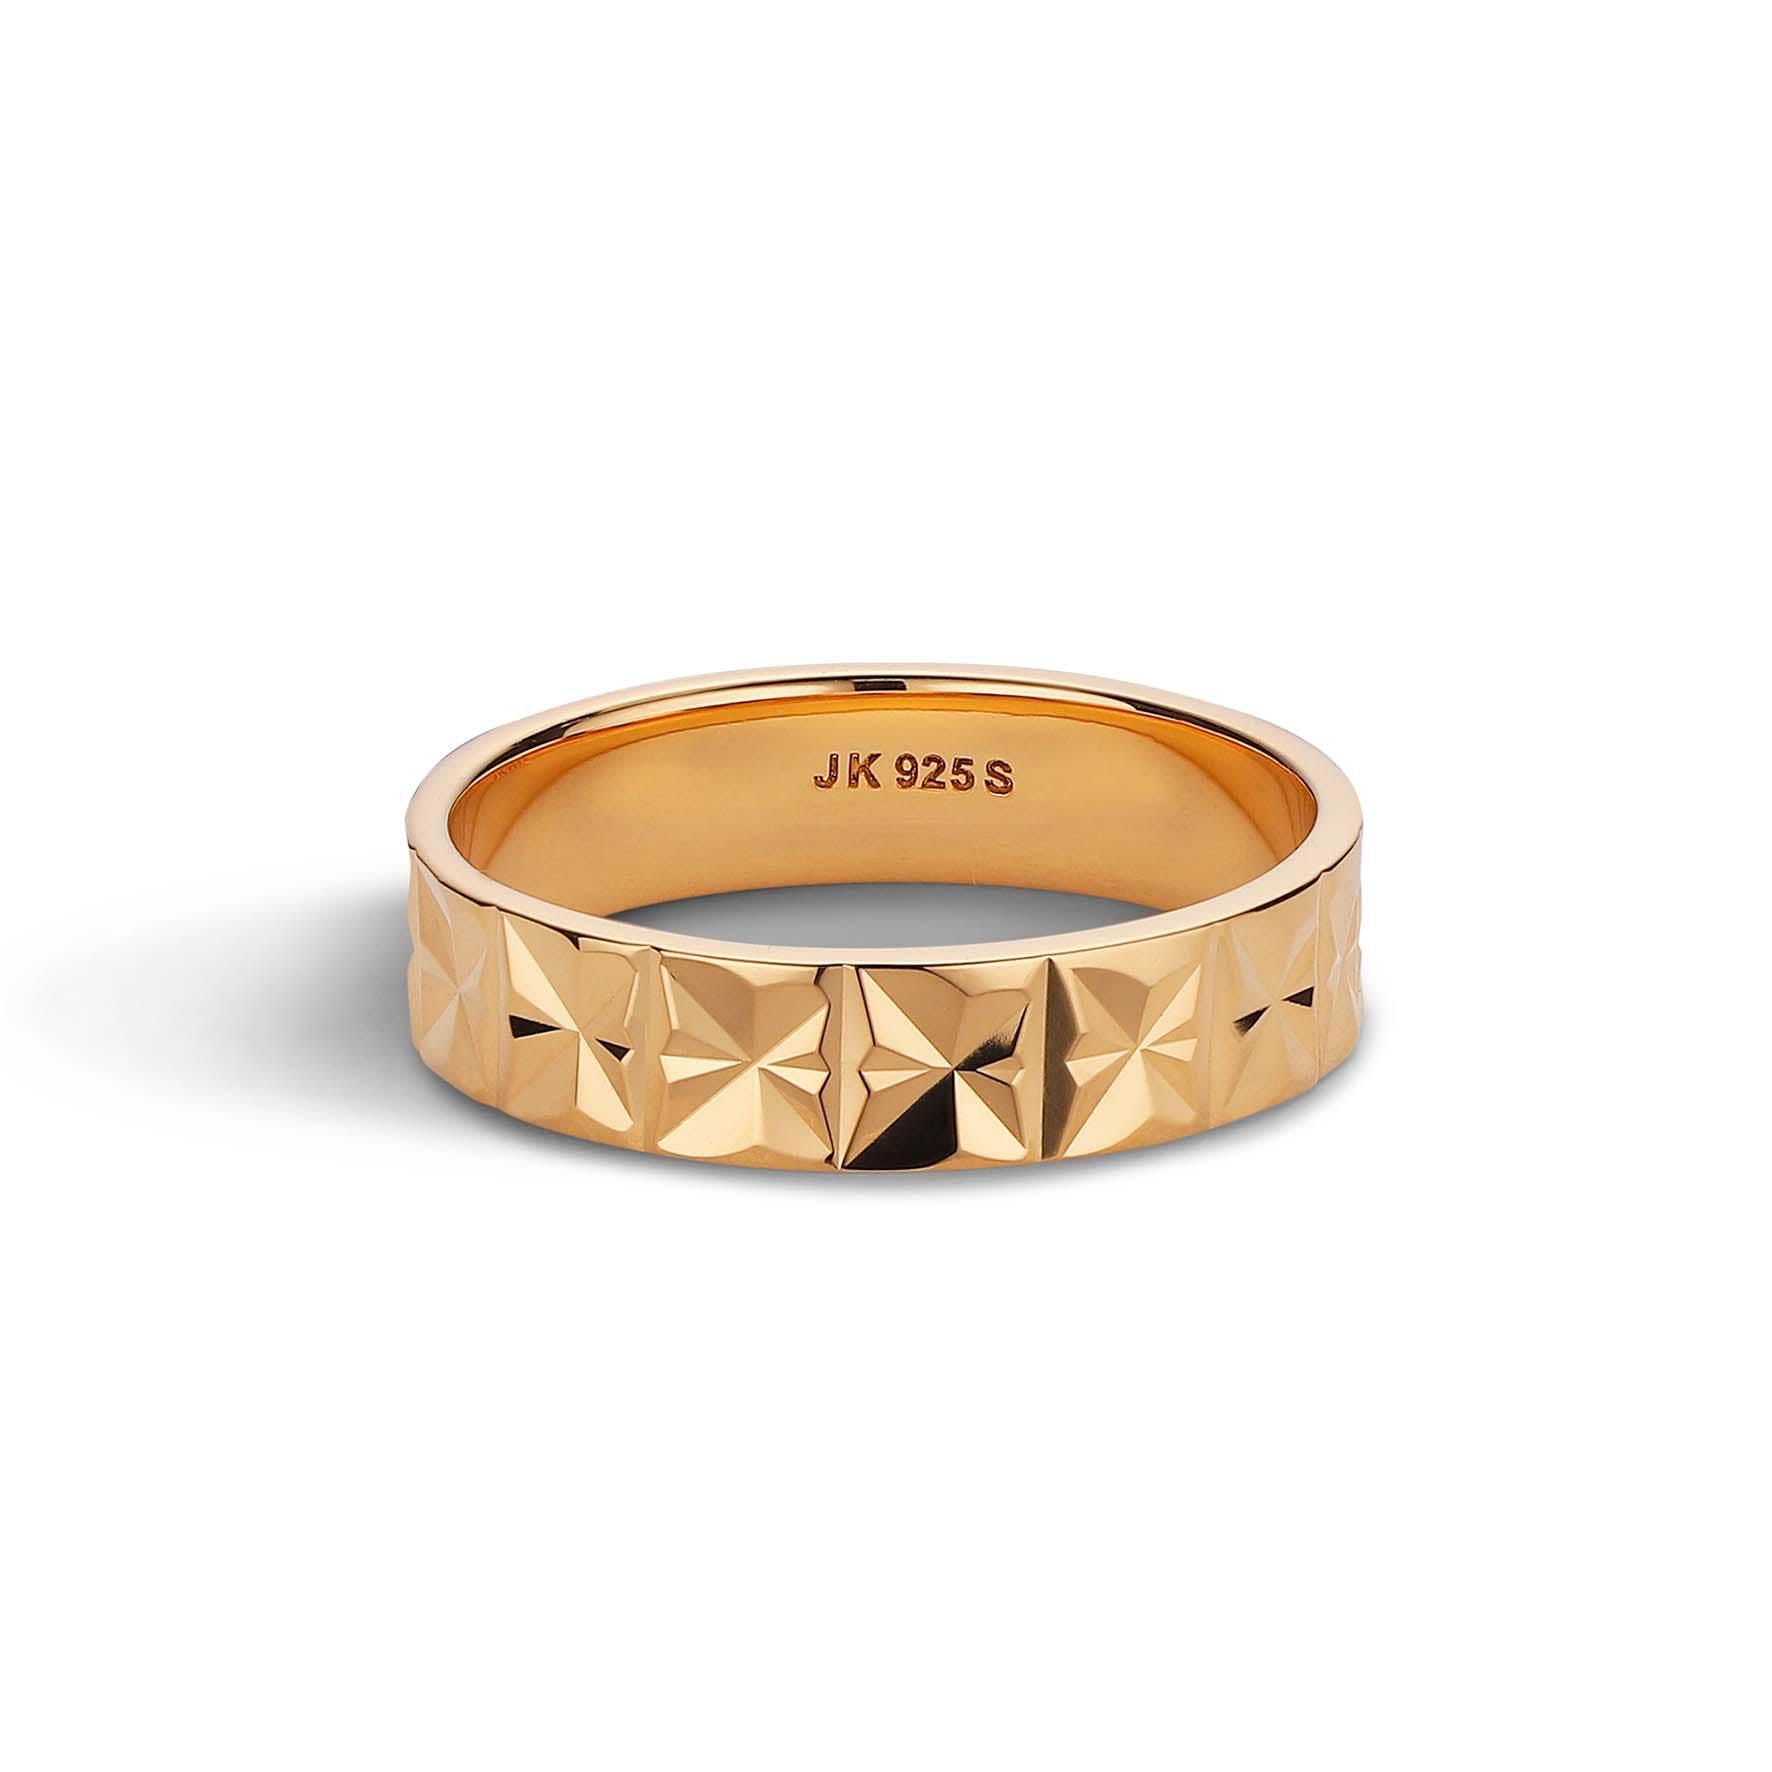 Medium Reflection Ring von Jane Kønig in Vergoldet-Silber Sterling 925